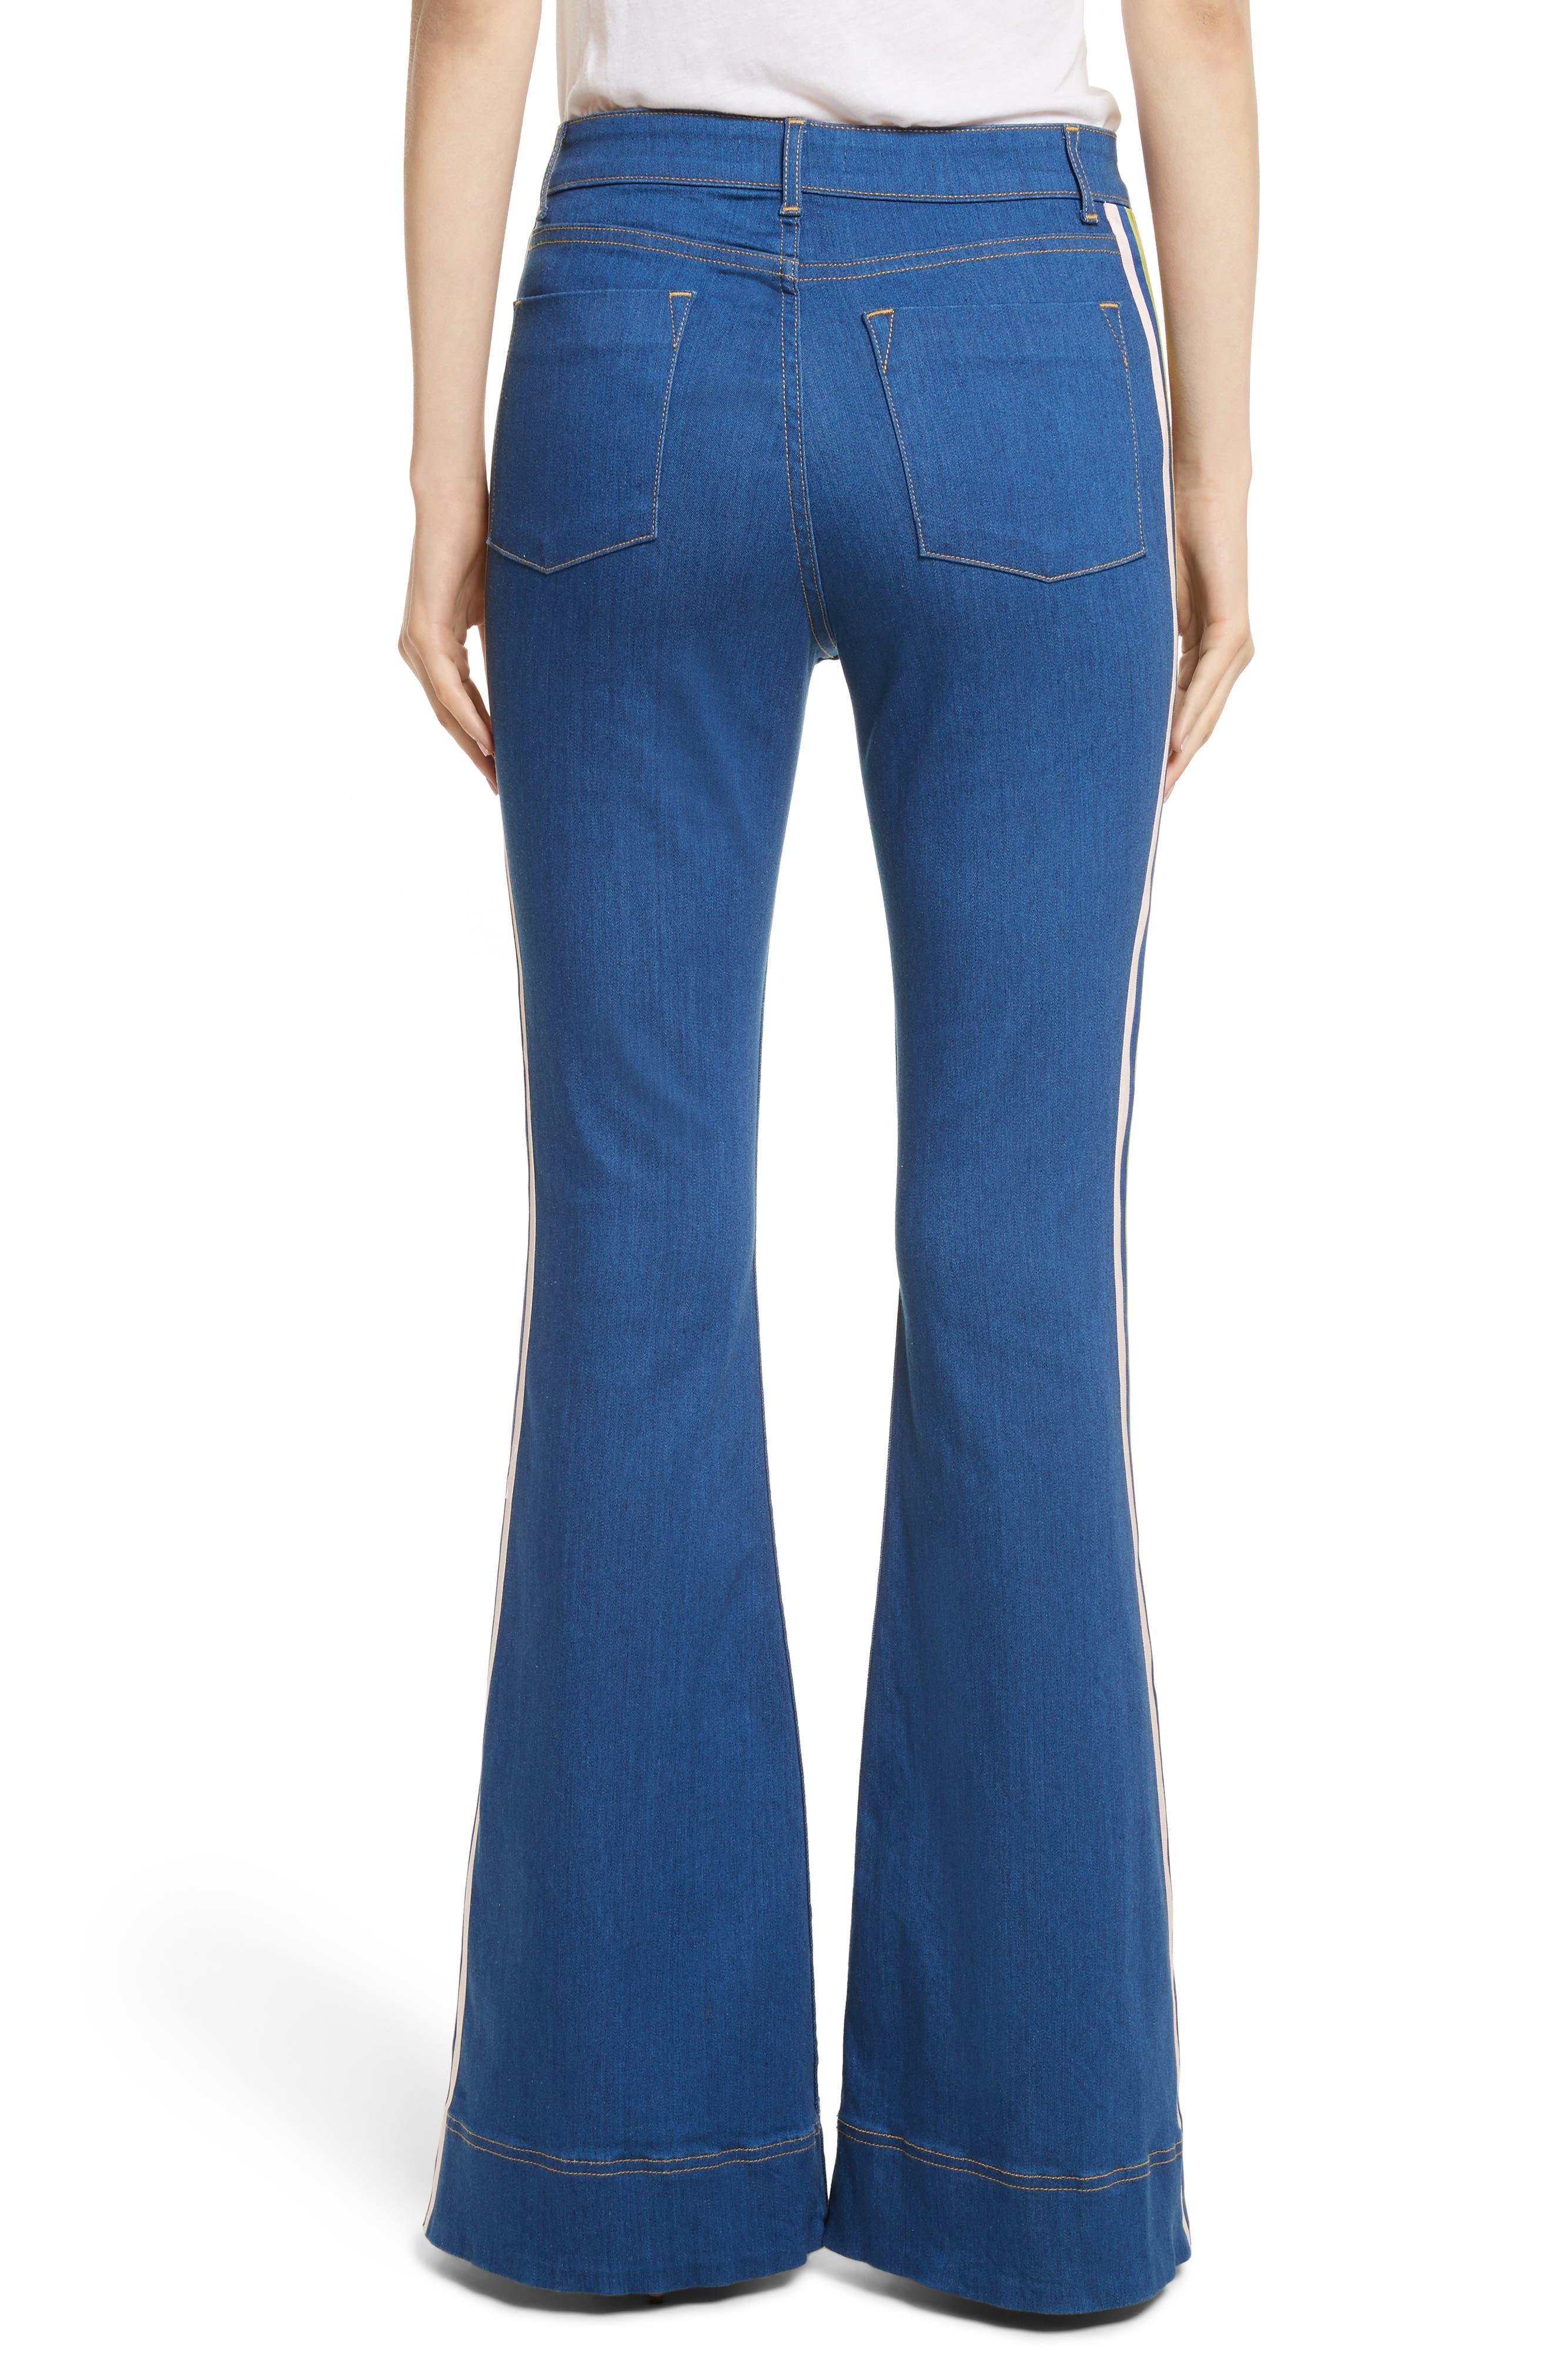 Alternate Image 2  - Alice + Olivia Kayleigh Bell Jeans